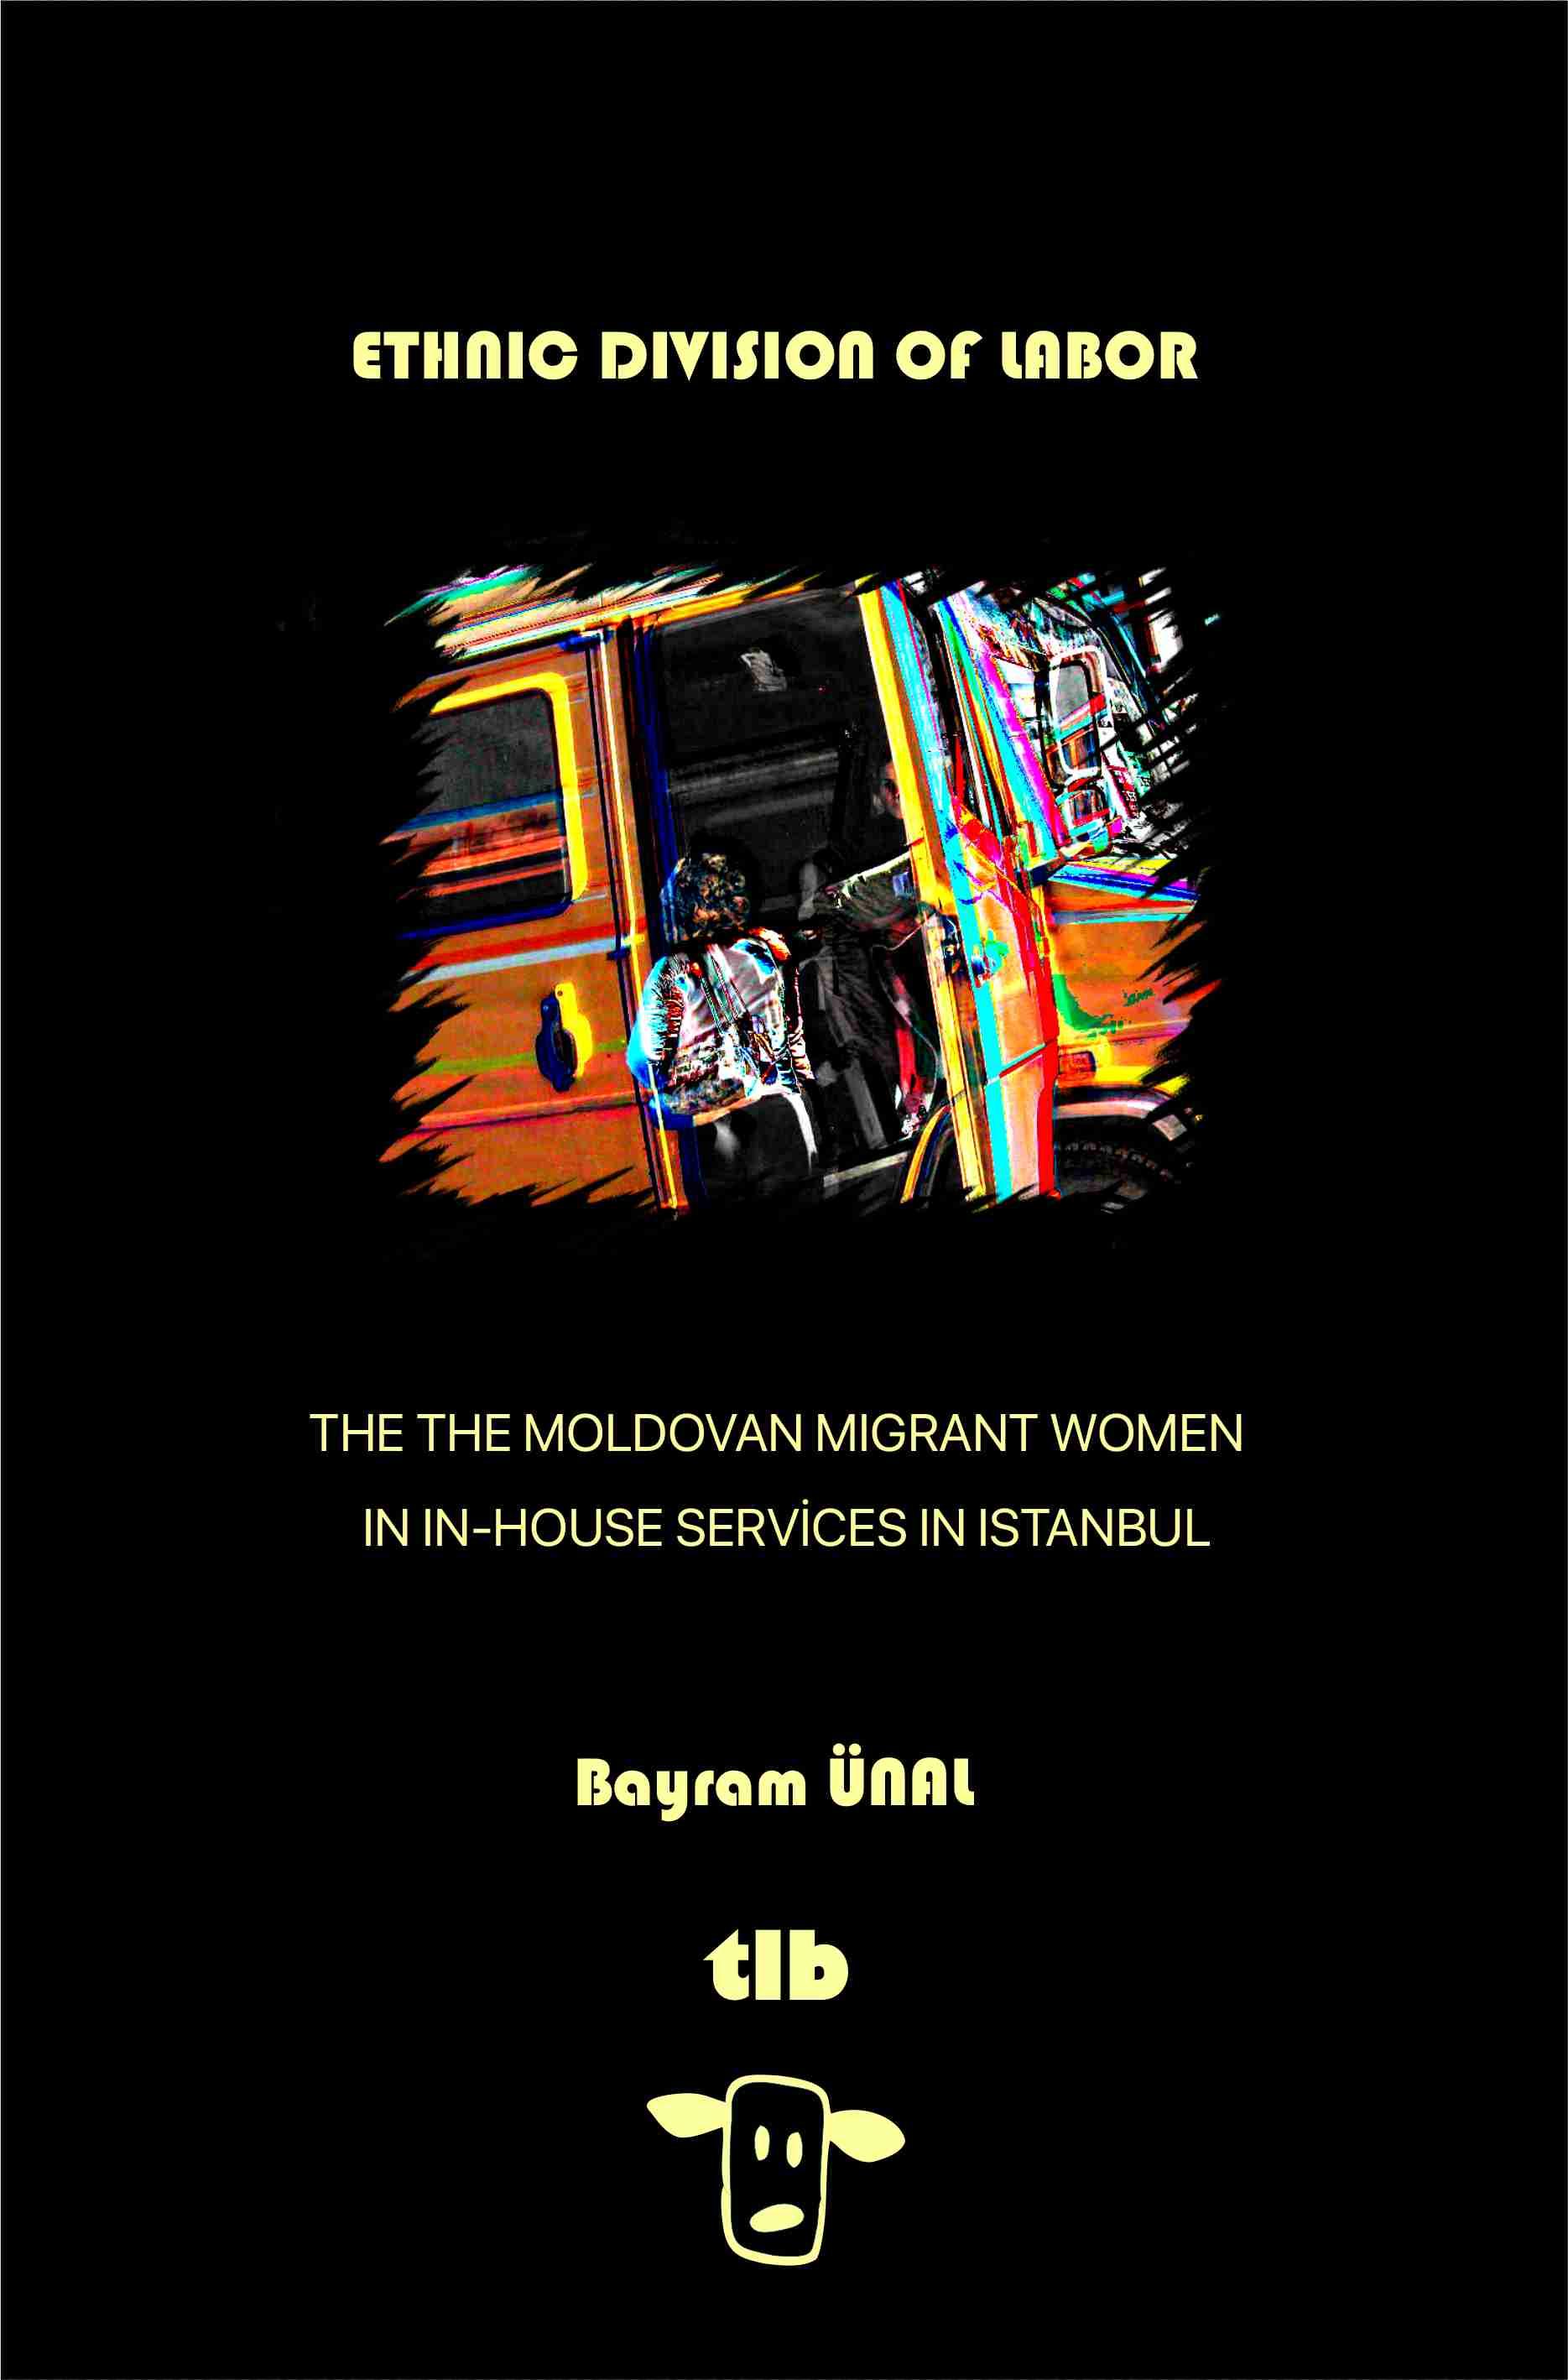 Ethnıc Dıvısıon Of Labor: The Moldovan Mıgrant Women In In-Houses